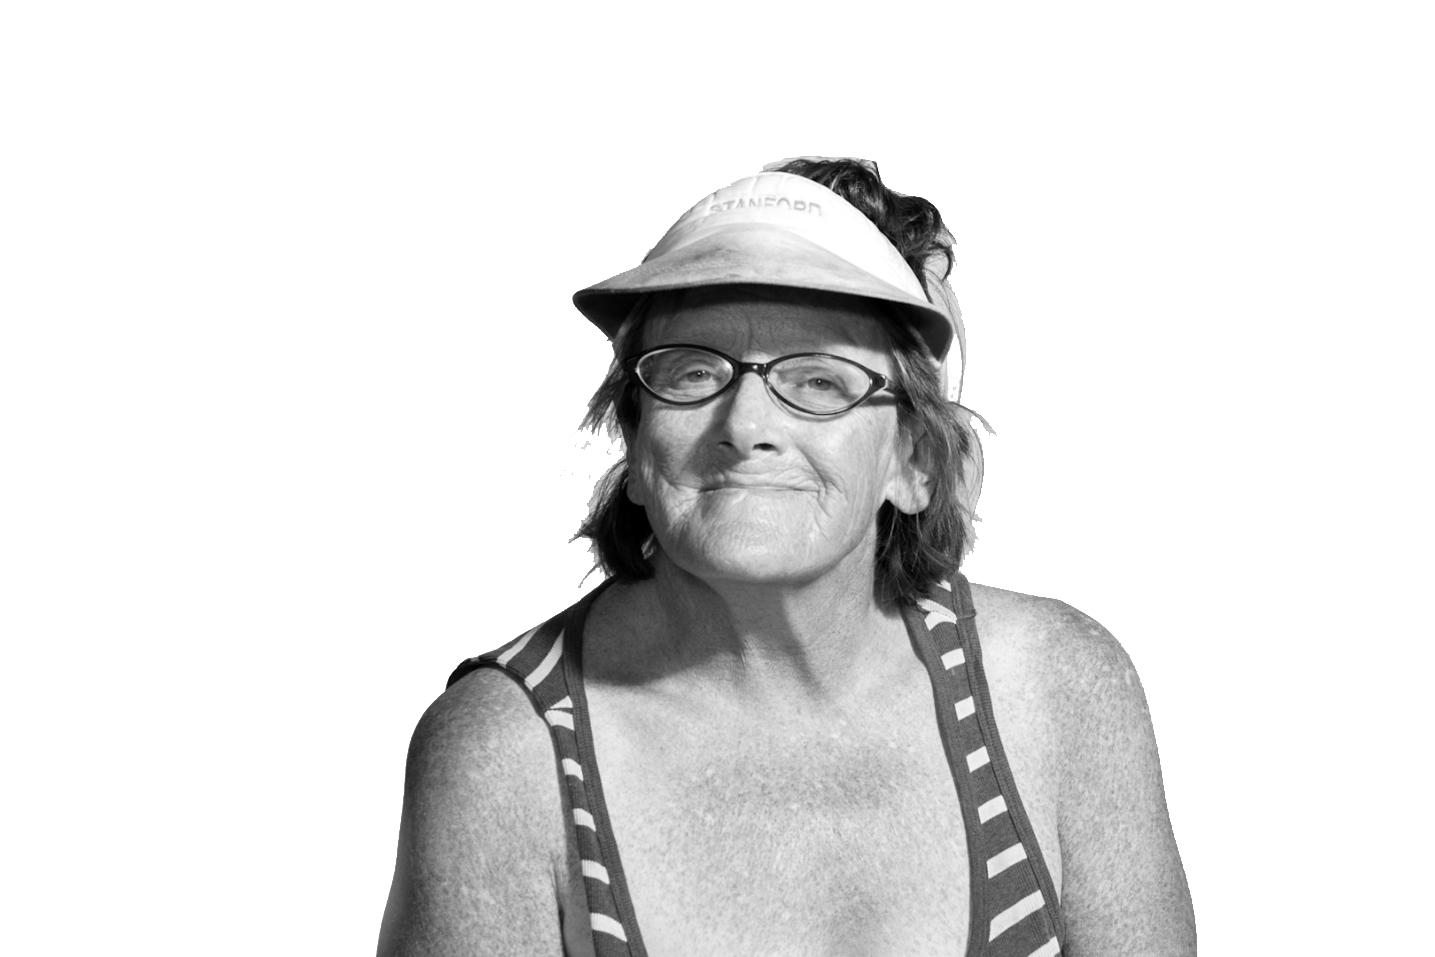 Susan, single woman on disability